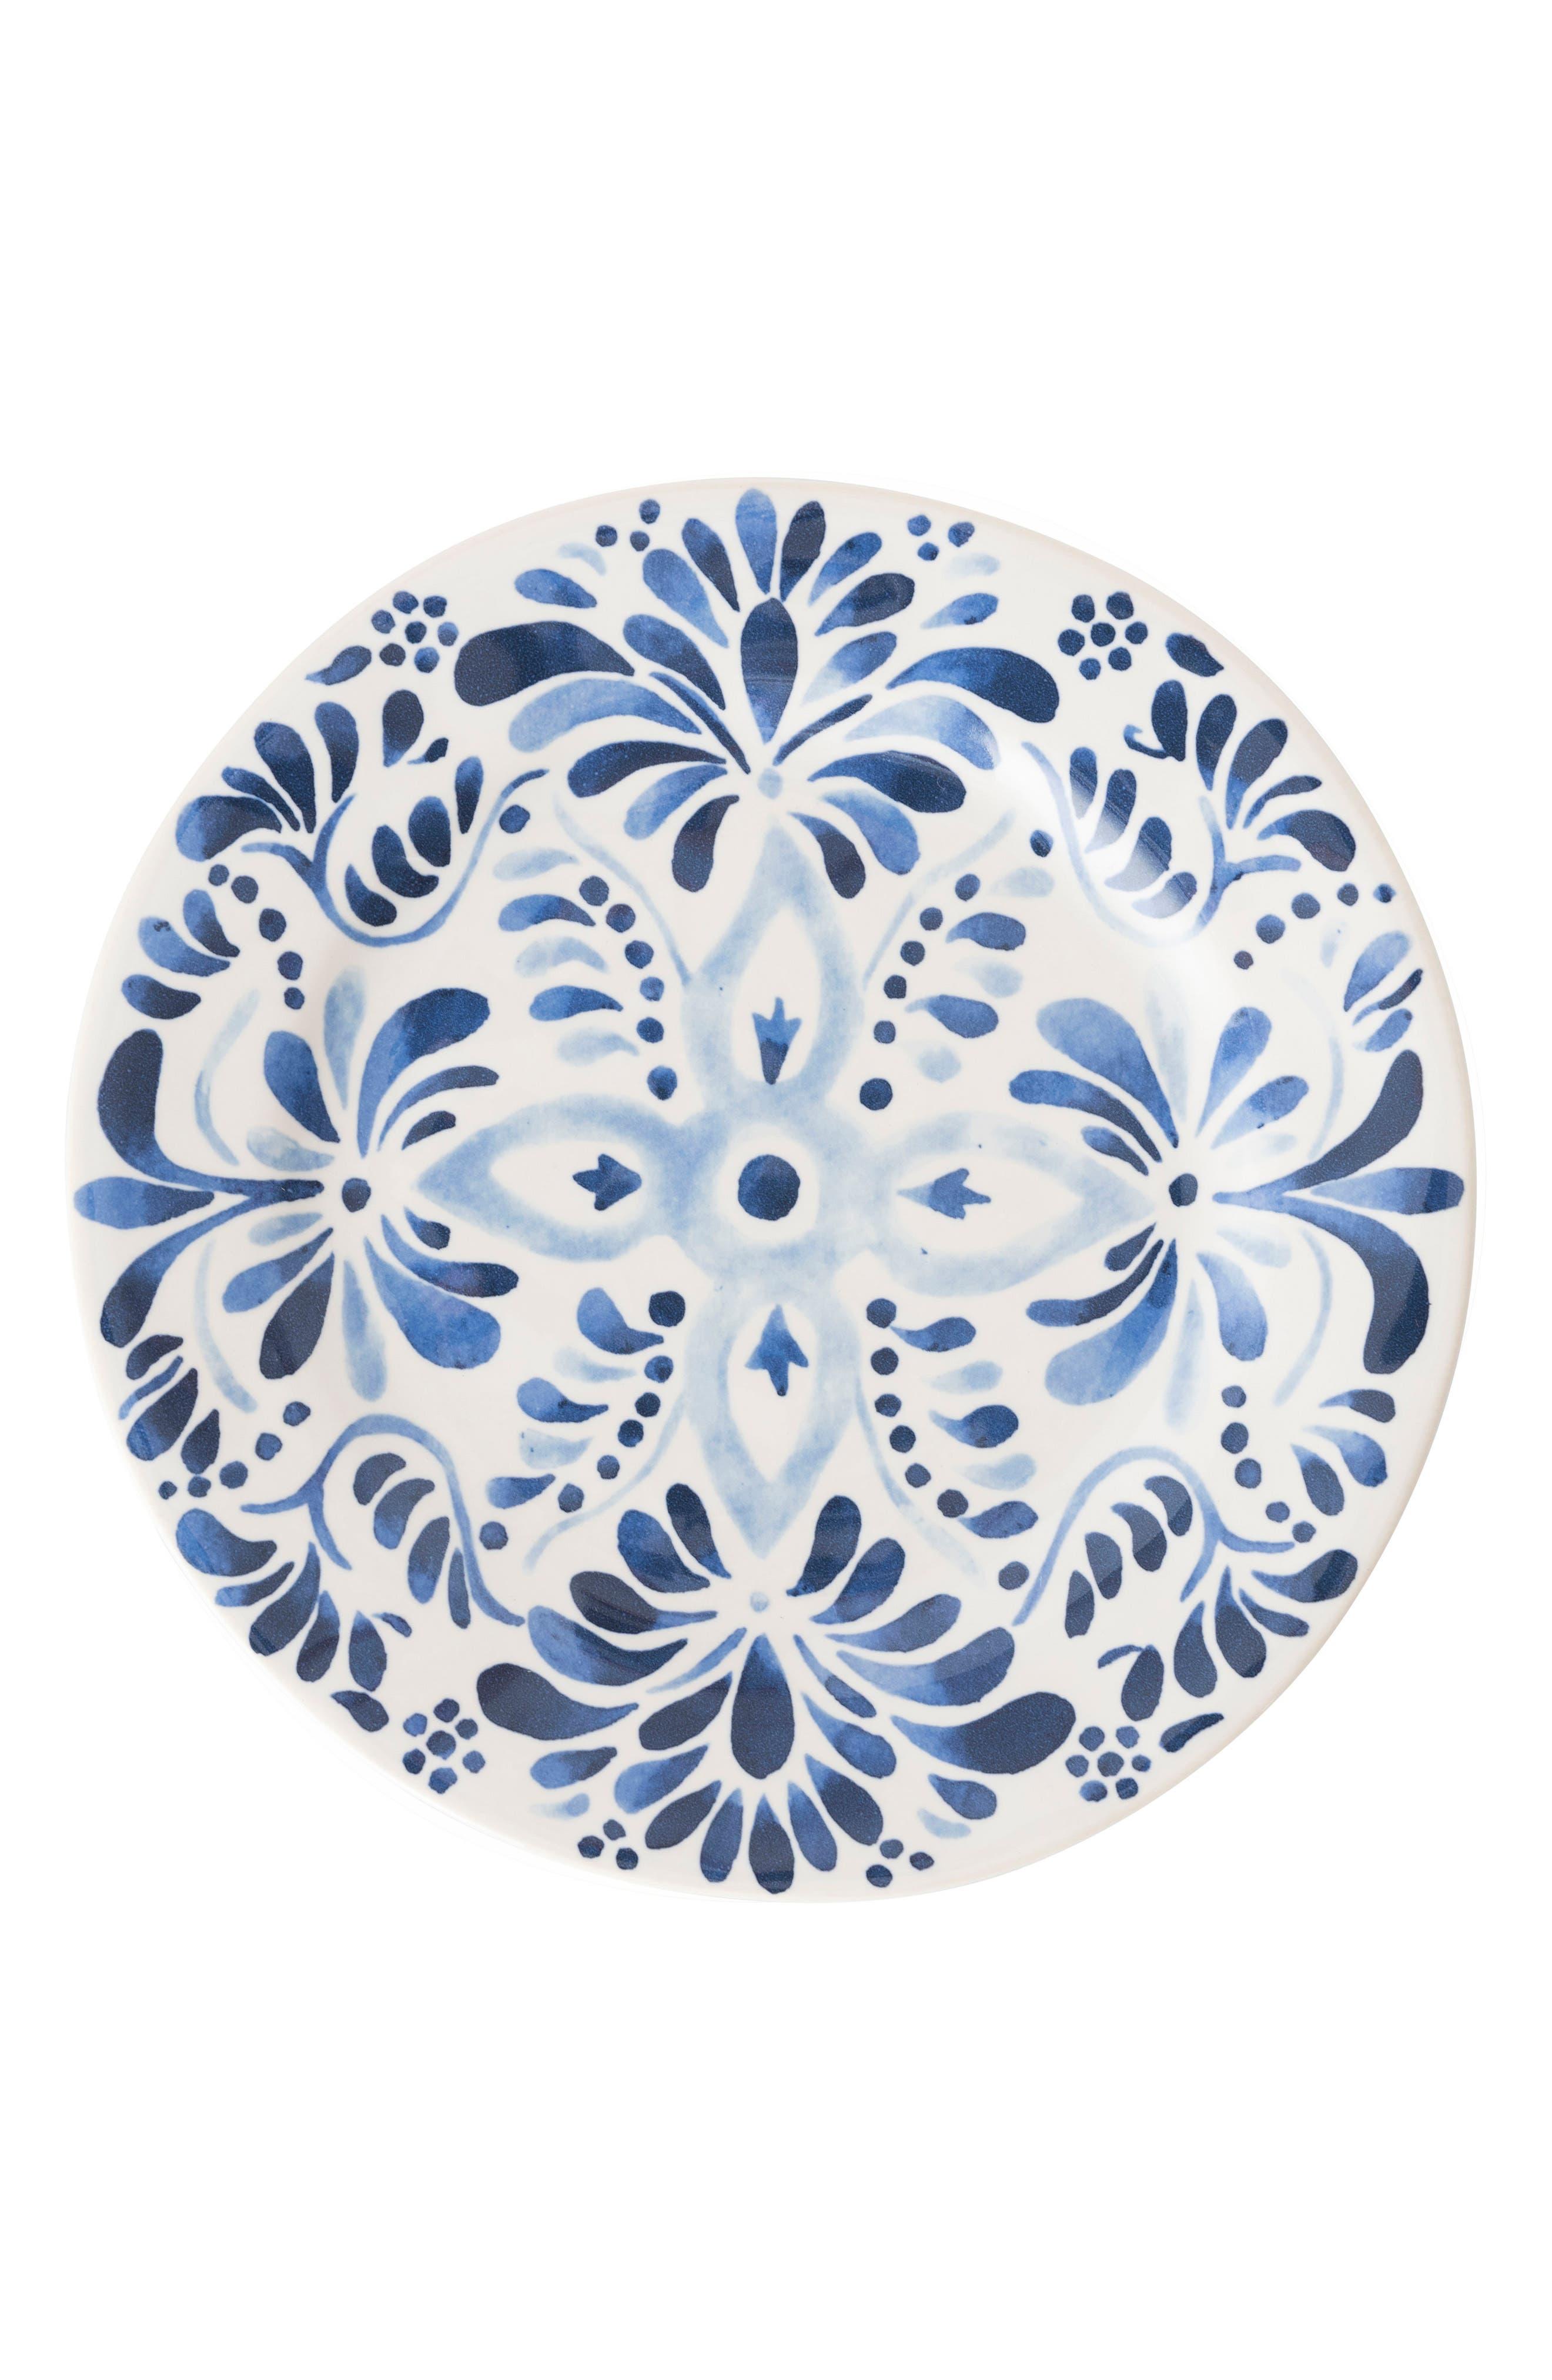 JULISKA, Wanderlust Collection - Iberian Journey Ceramic Salad/Dessert Plate, Main thumbnail 1, color, INDIGO